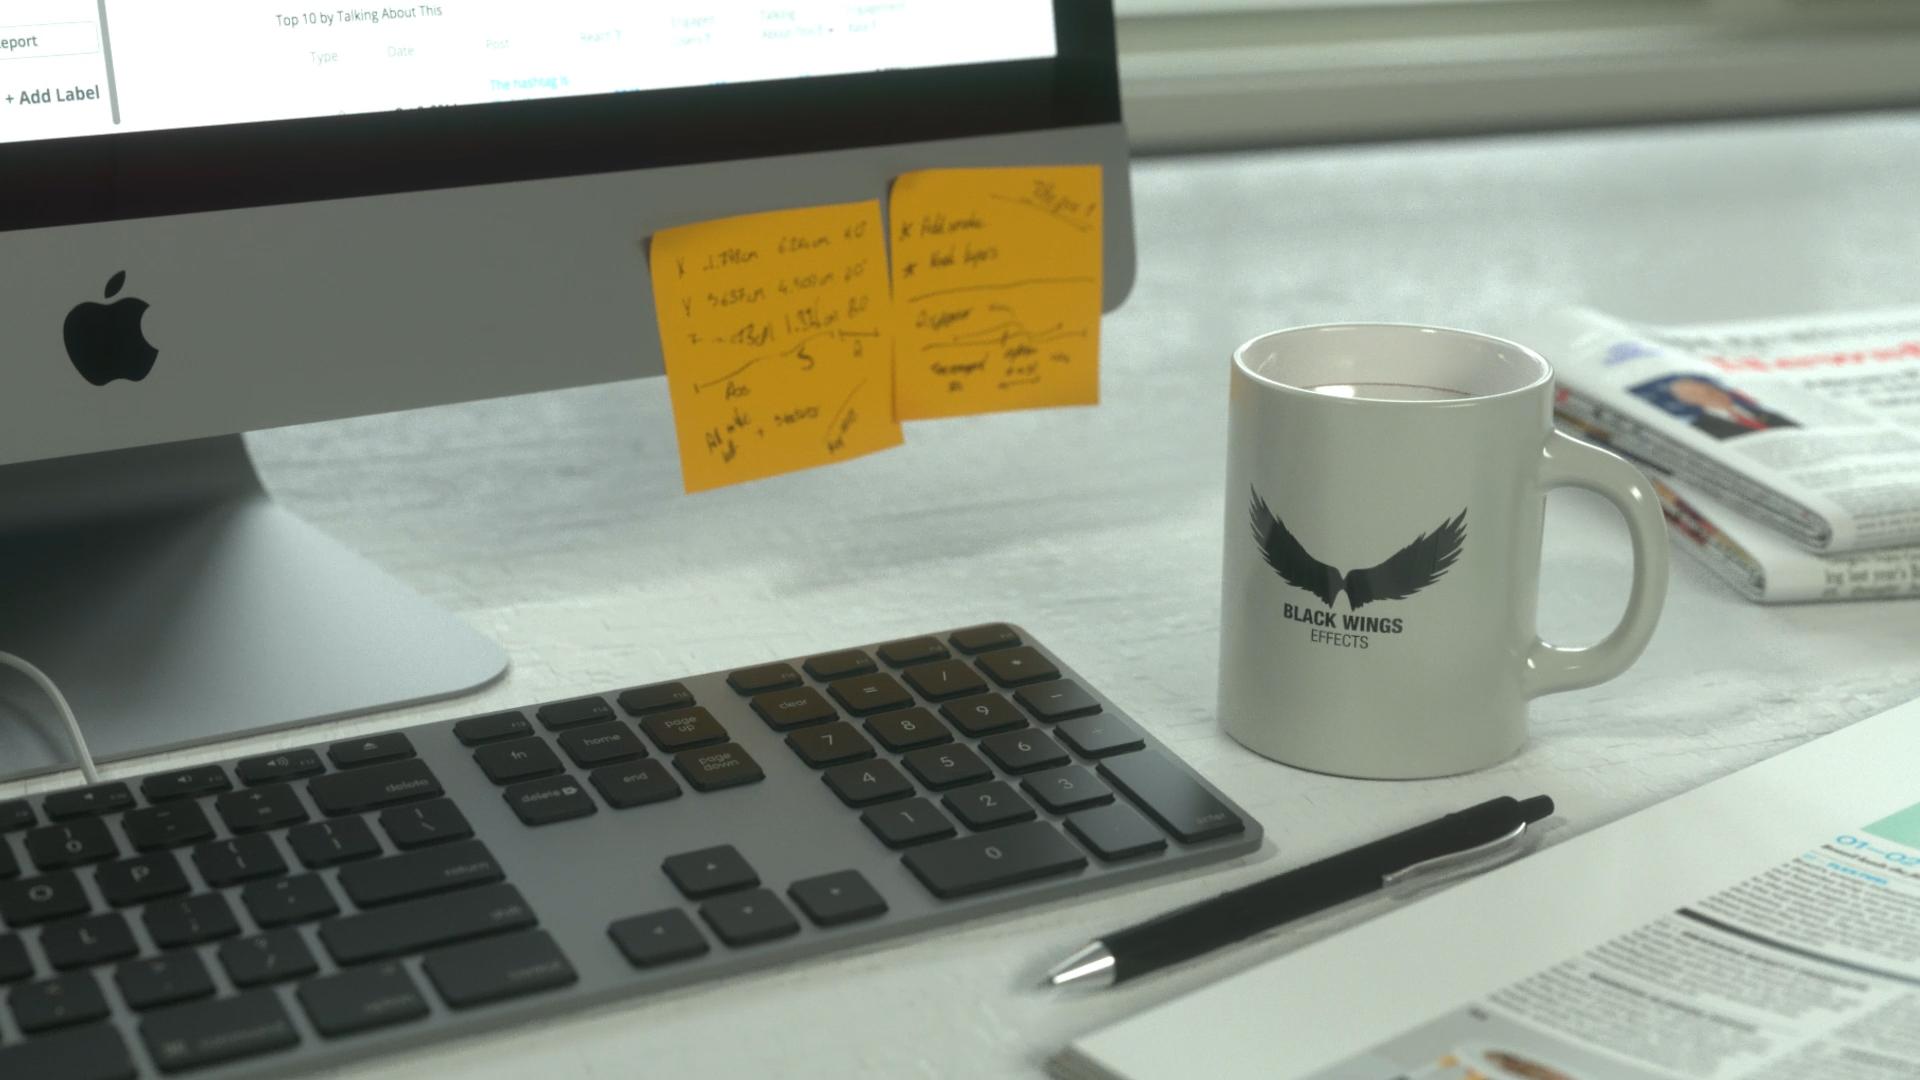 Black Wings Effects Desk Set_Thumbnail.jpg